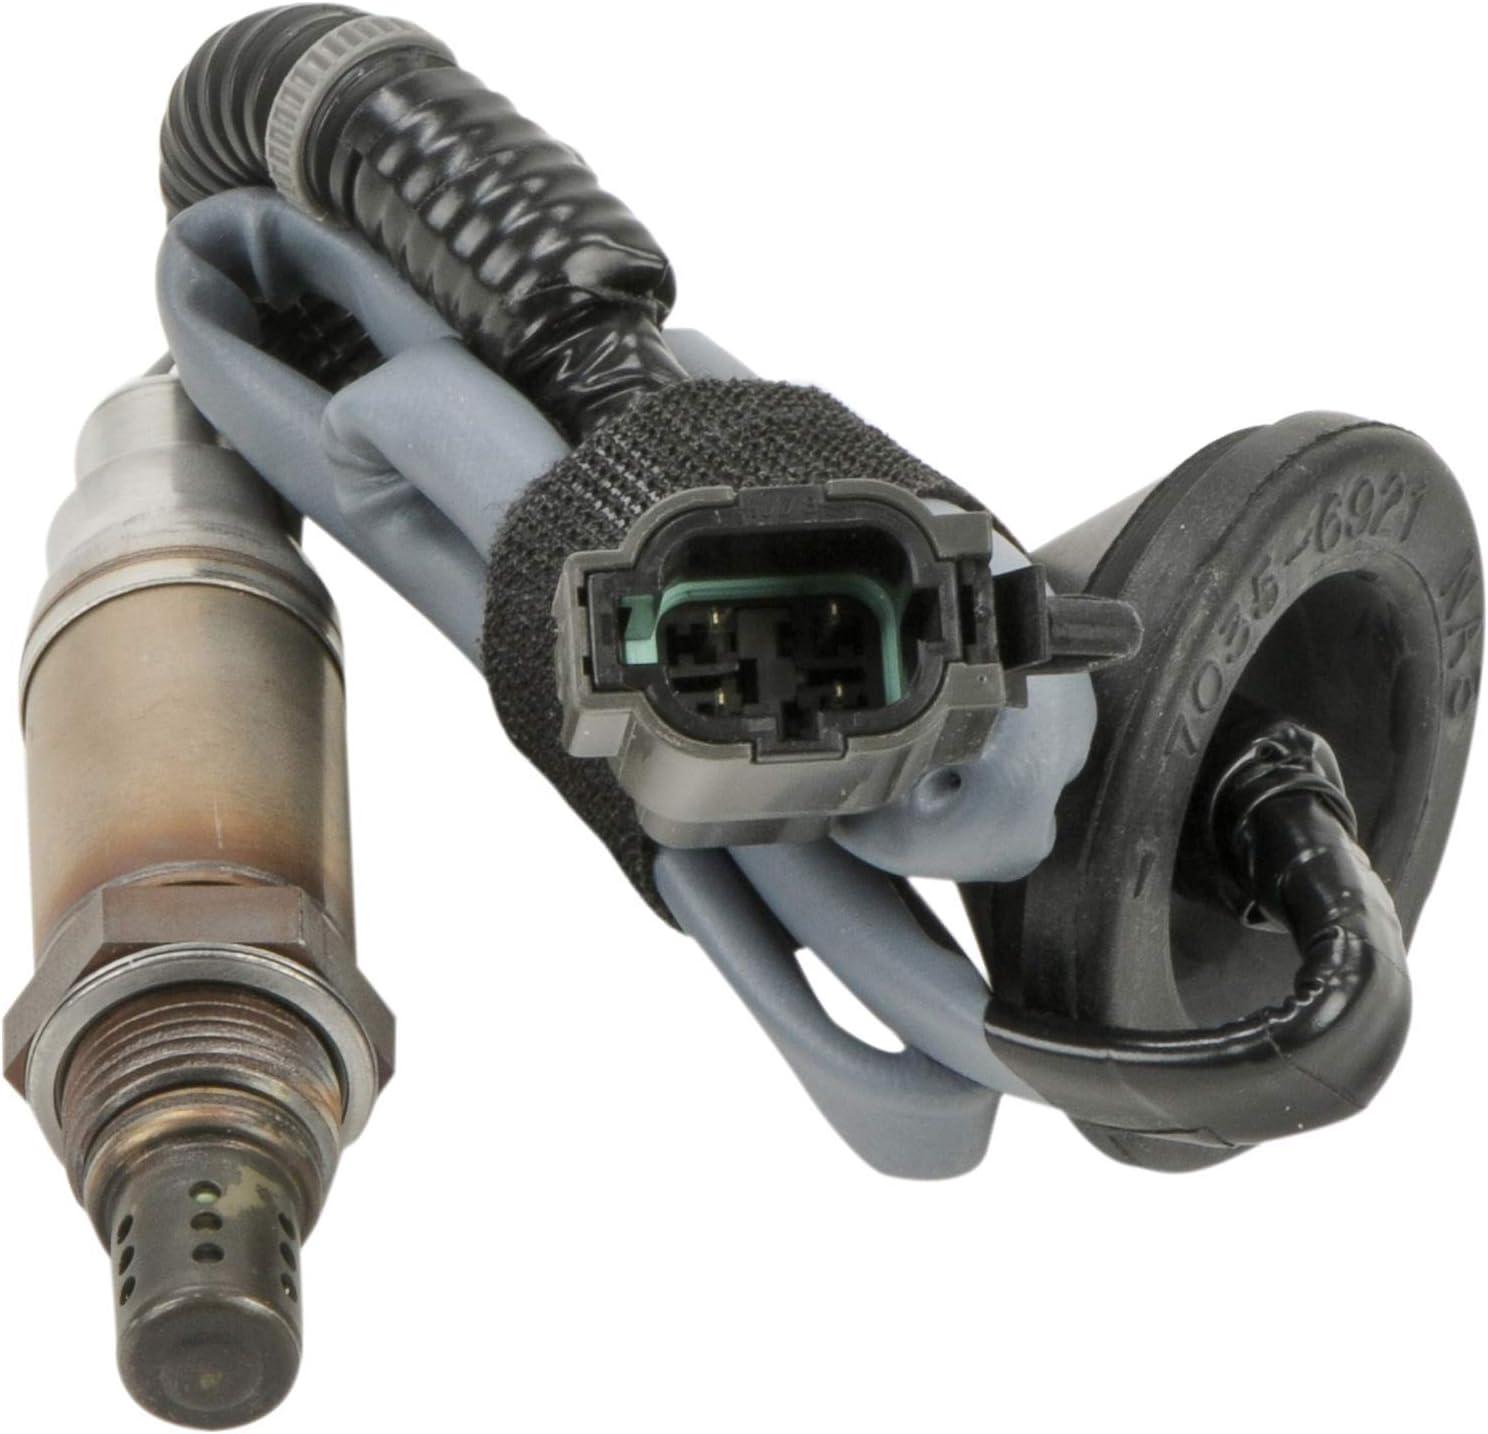 Bosch 15881 Oxygen Sensor Equipment Original Nissan lowest Max 78% OFF price